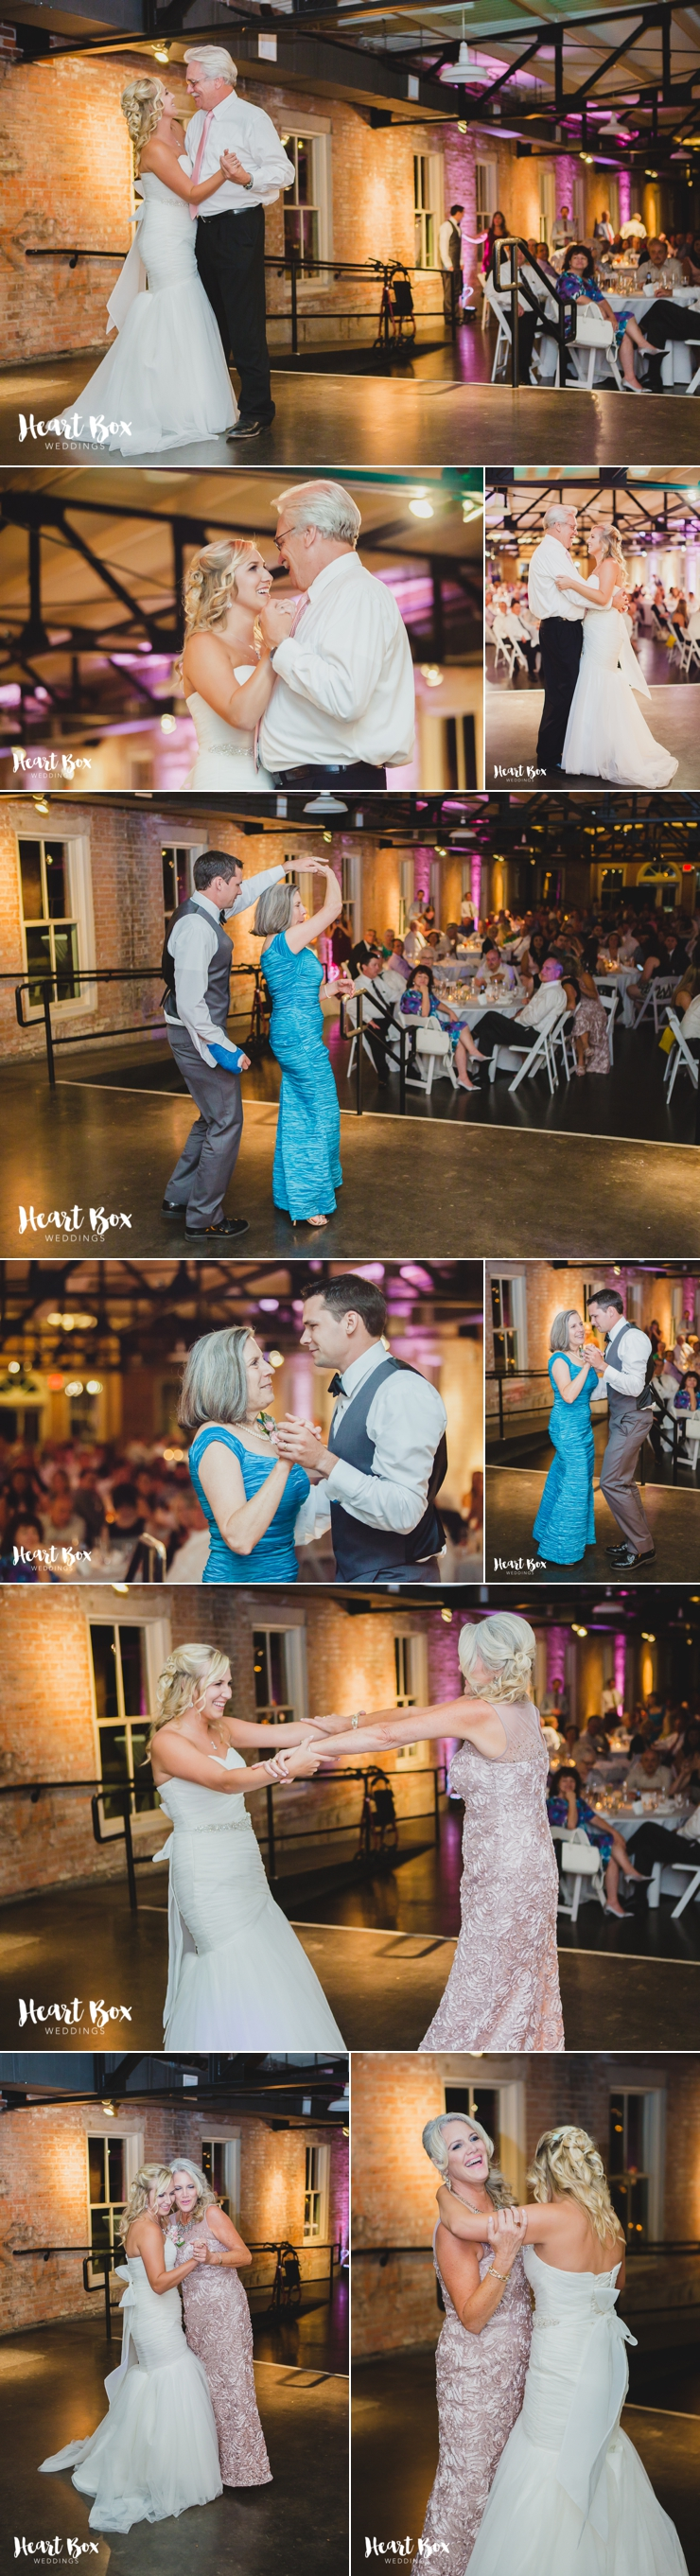 Gould Wedding Blog Collages 19.jpg